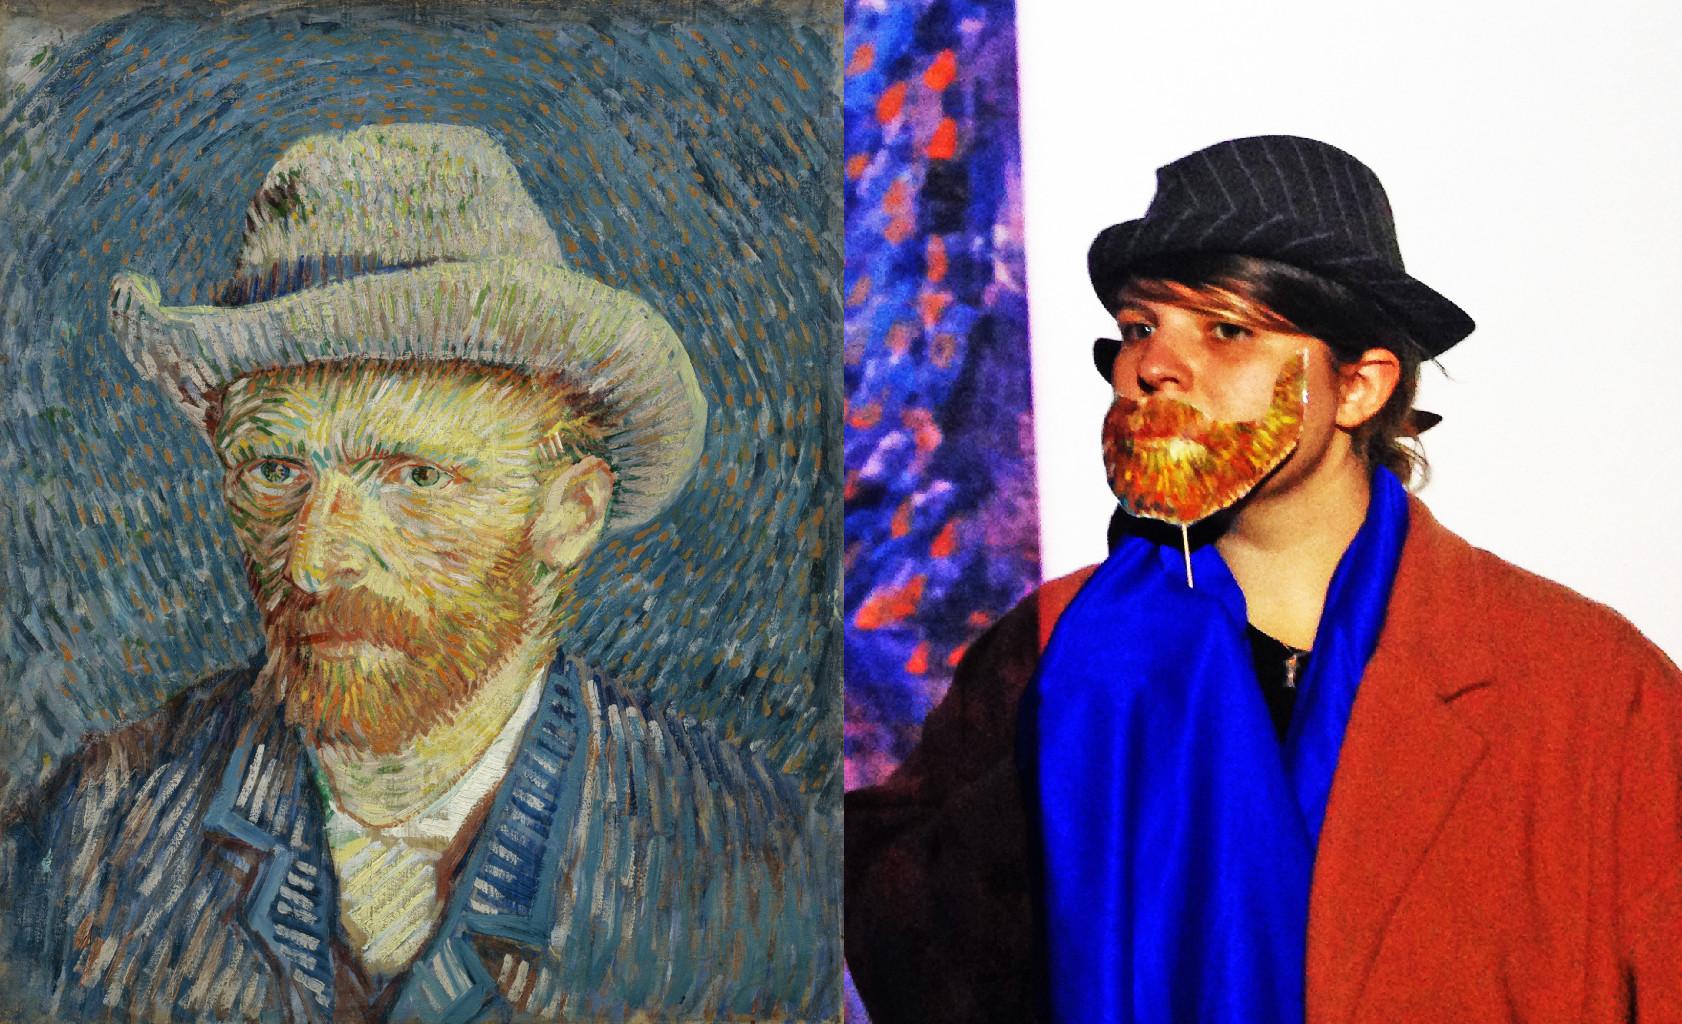 Self-Portrait with Grey Felt Hat, Vincent van Gogh (1853-1890) vanGo'd by Eddie